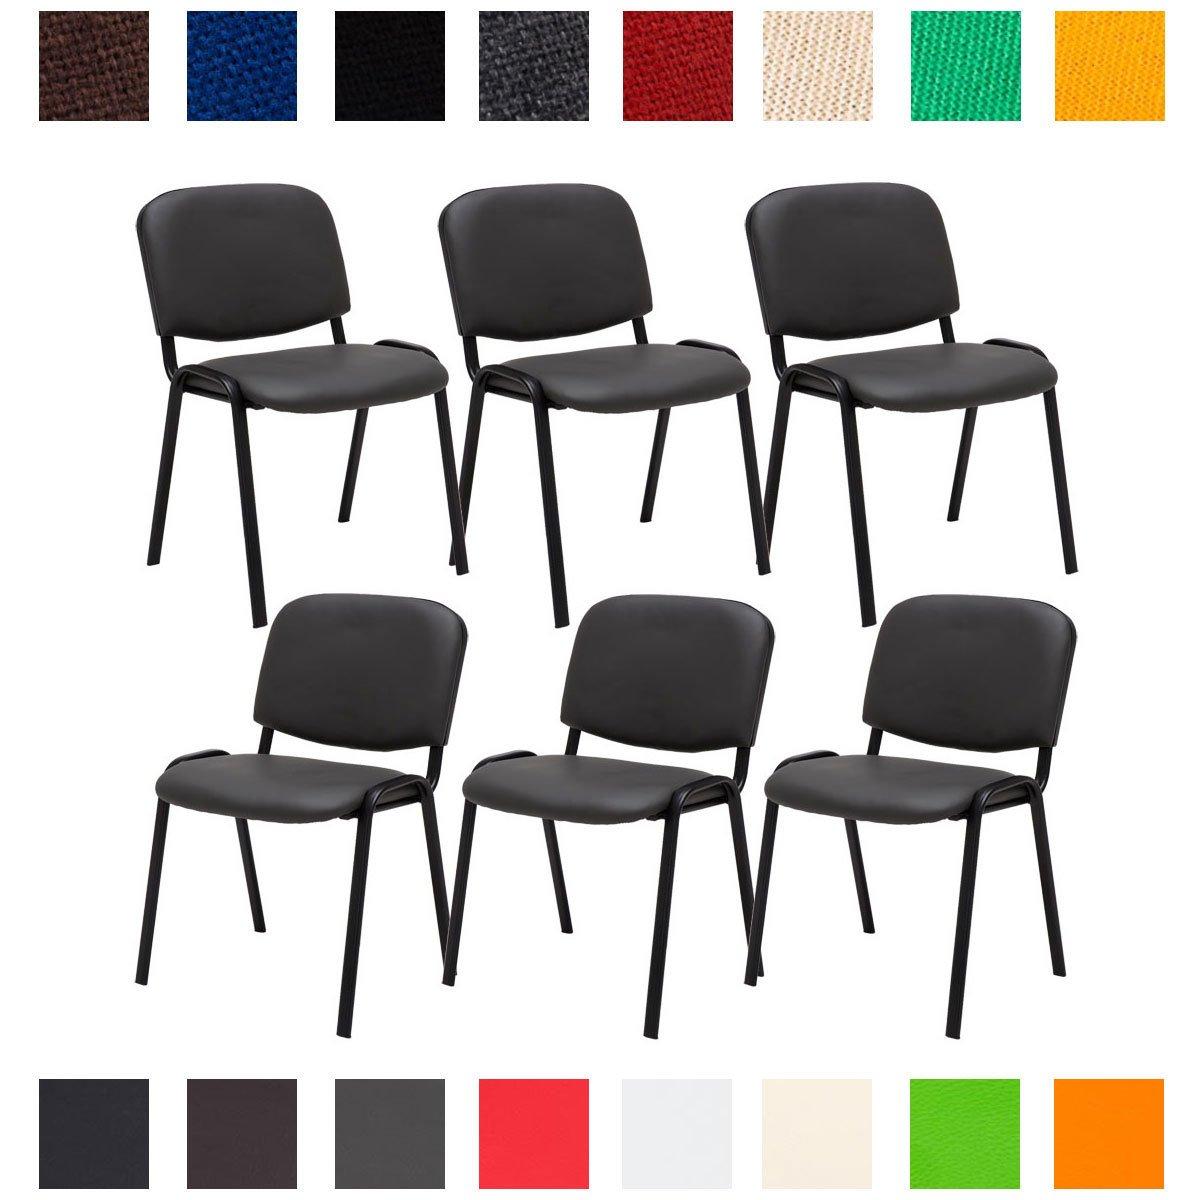 CLP 6X Konferenzstuhl Ken mit Stoffbezug oder Kunstlederbezug I 6 x Stapelstuhl mit robustem Metallgestell I erhältlich Kunstlederbezug  Grau